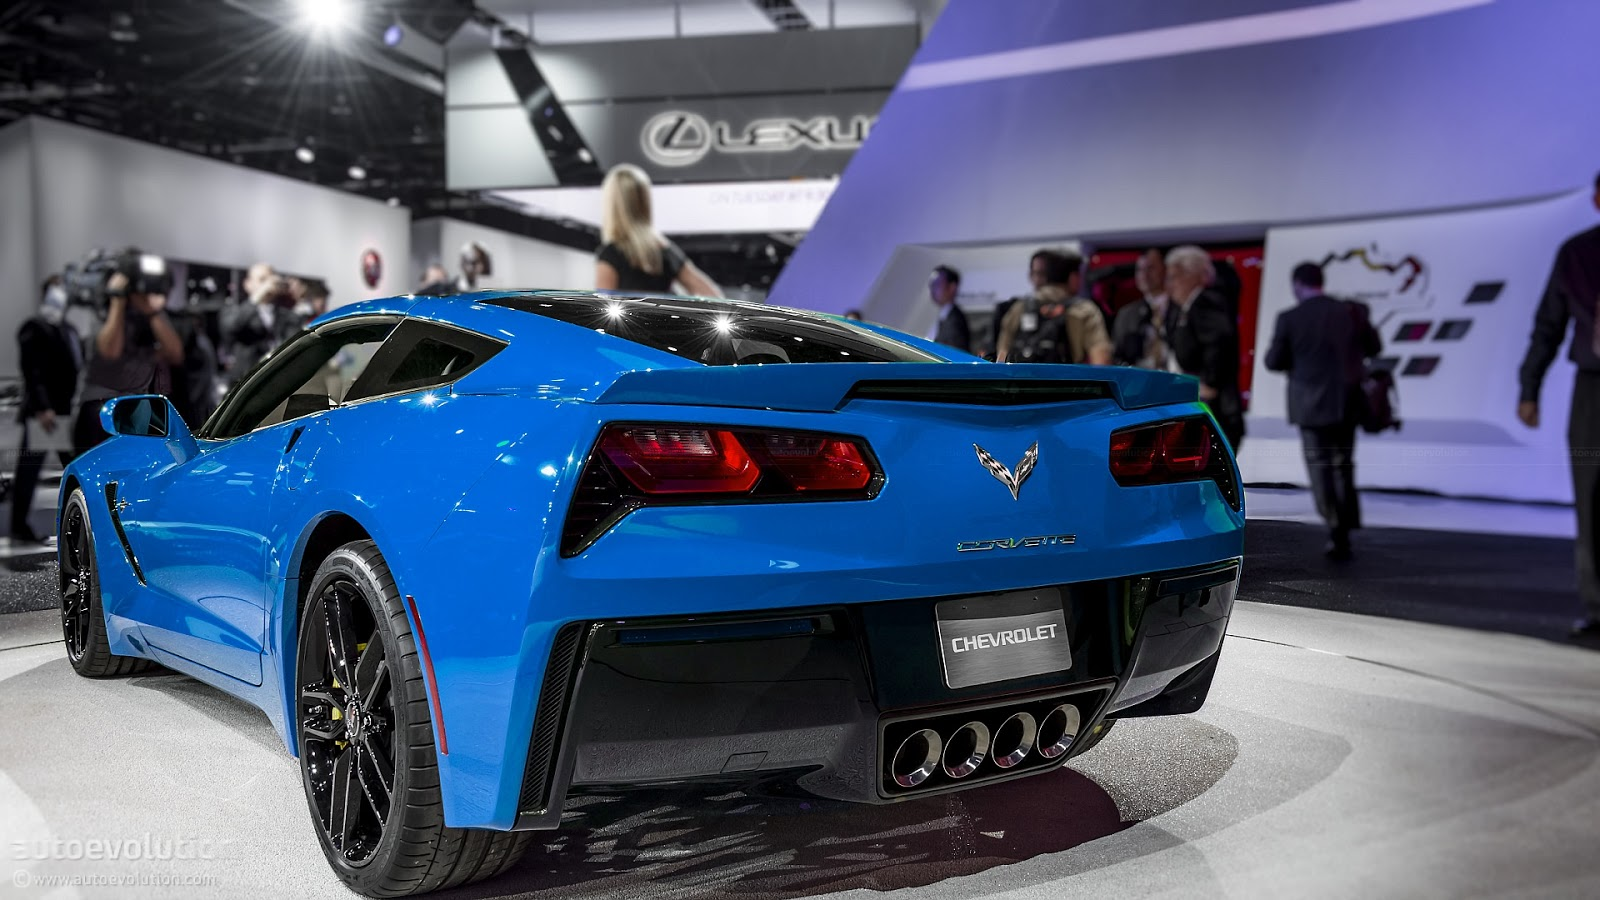 2014 Corvette Blue Cars